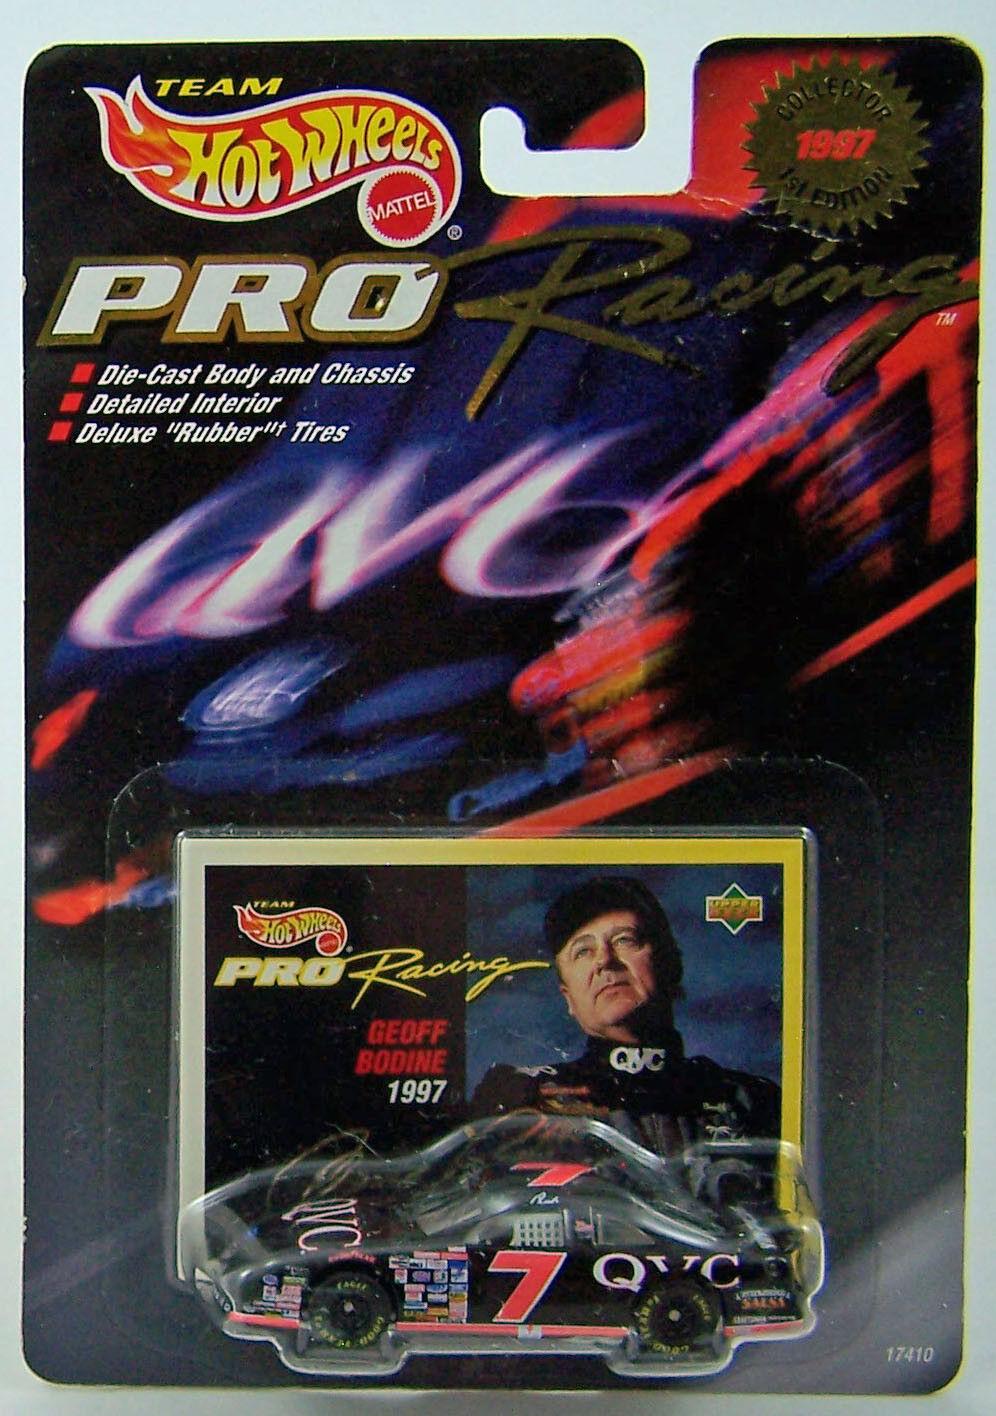 1997 Hot Wheels 1:64 Pro Racing Racing Pro 1st Ed GEOFF BODINE  7 QVC Ford T-Bird - NIP cfbcba